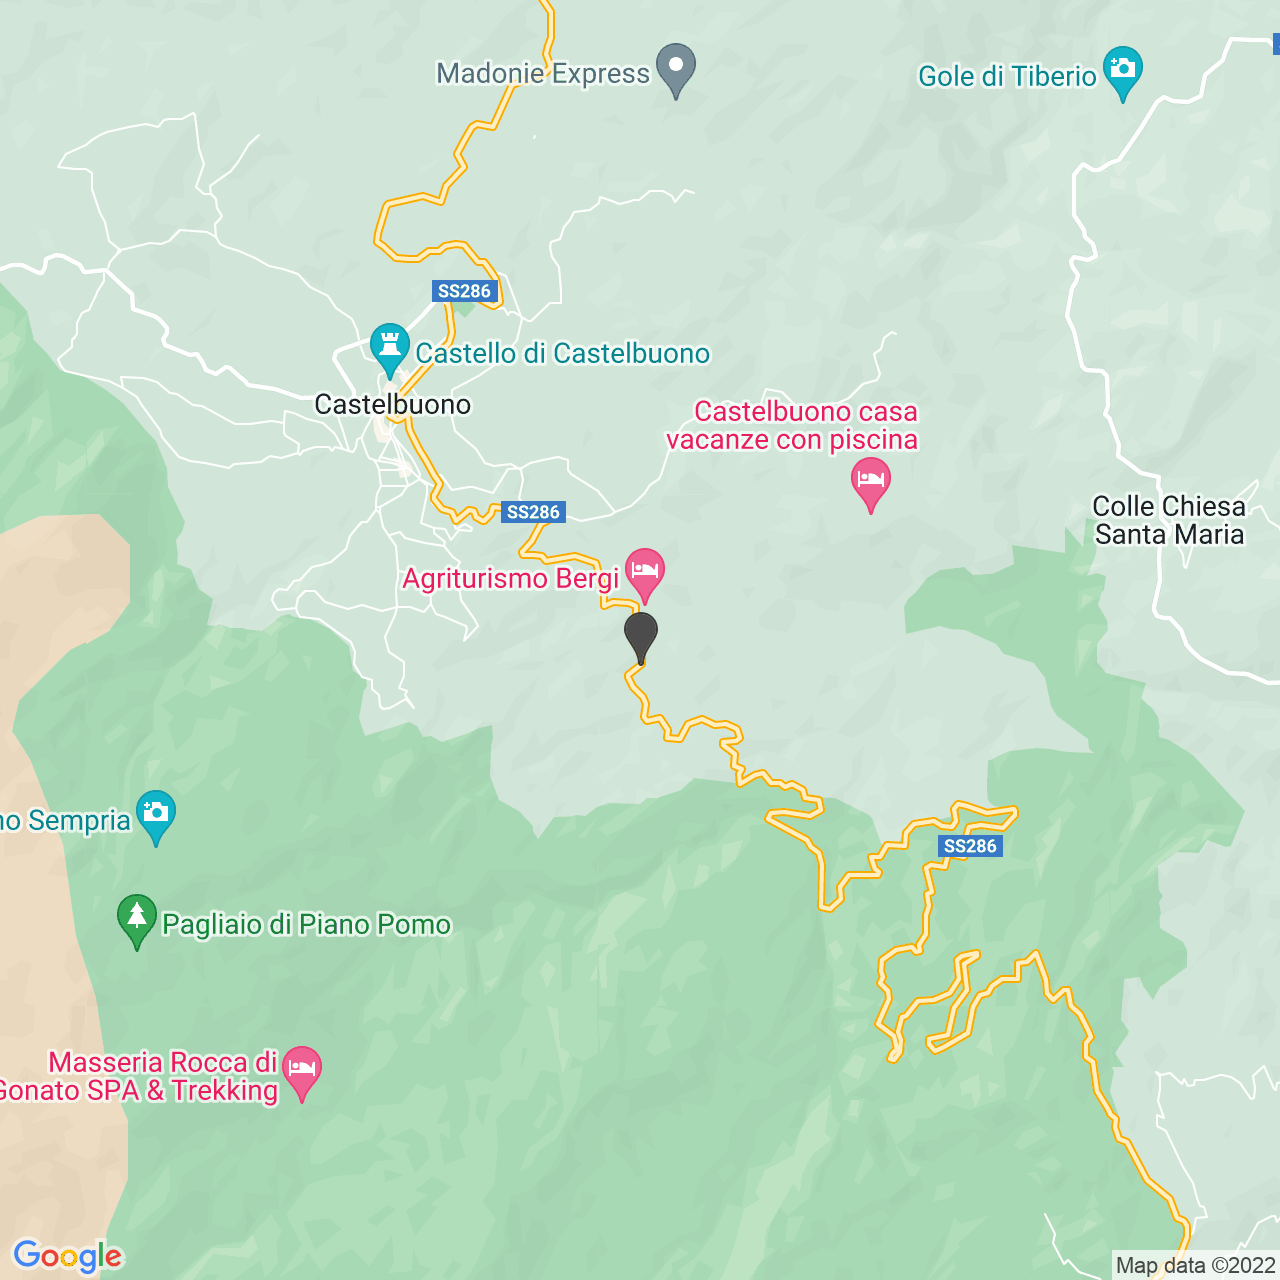 CIMITERO CASTELBUONO